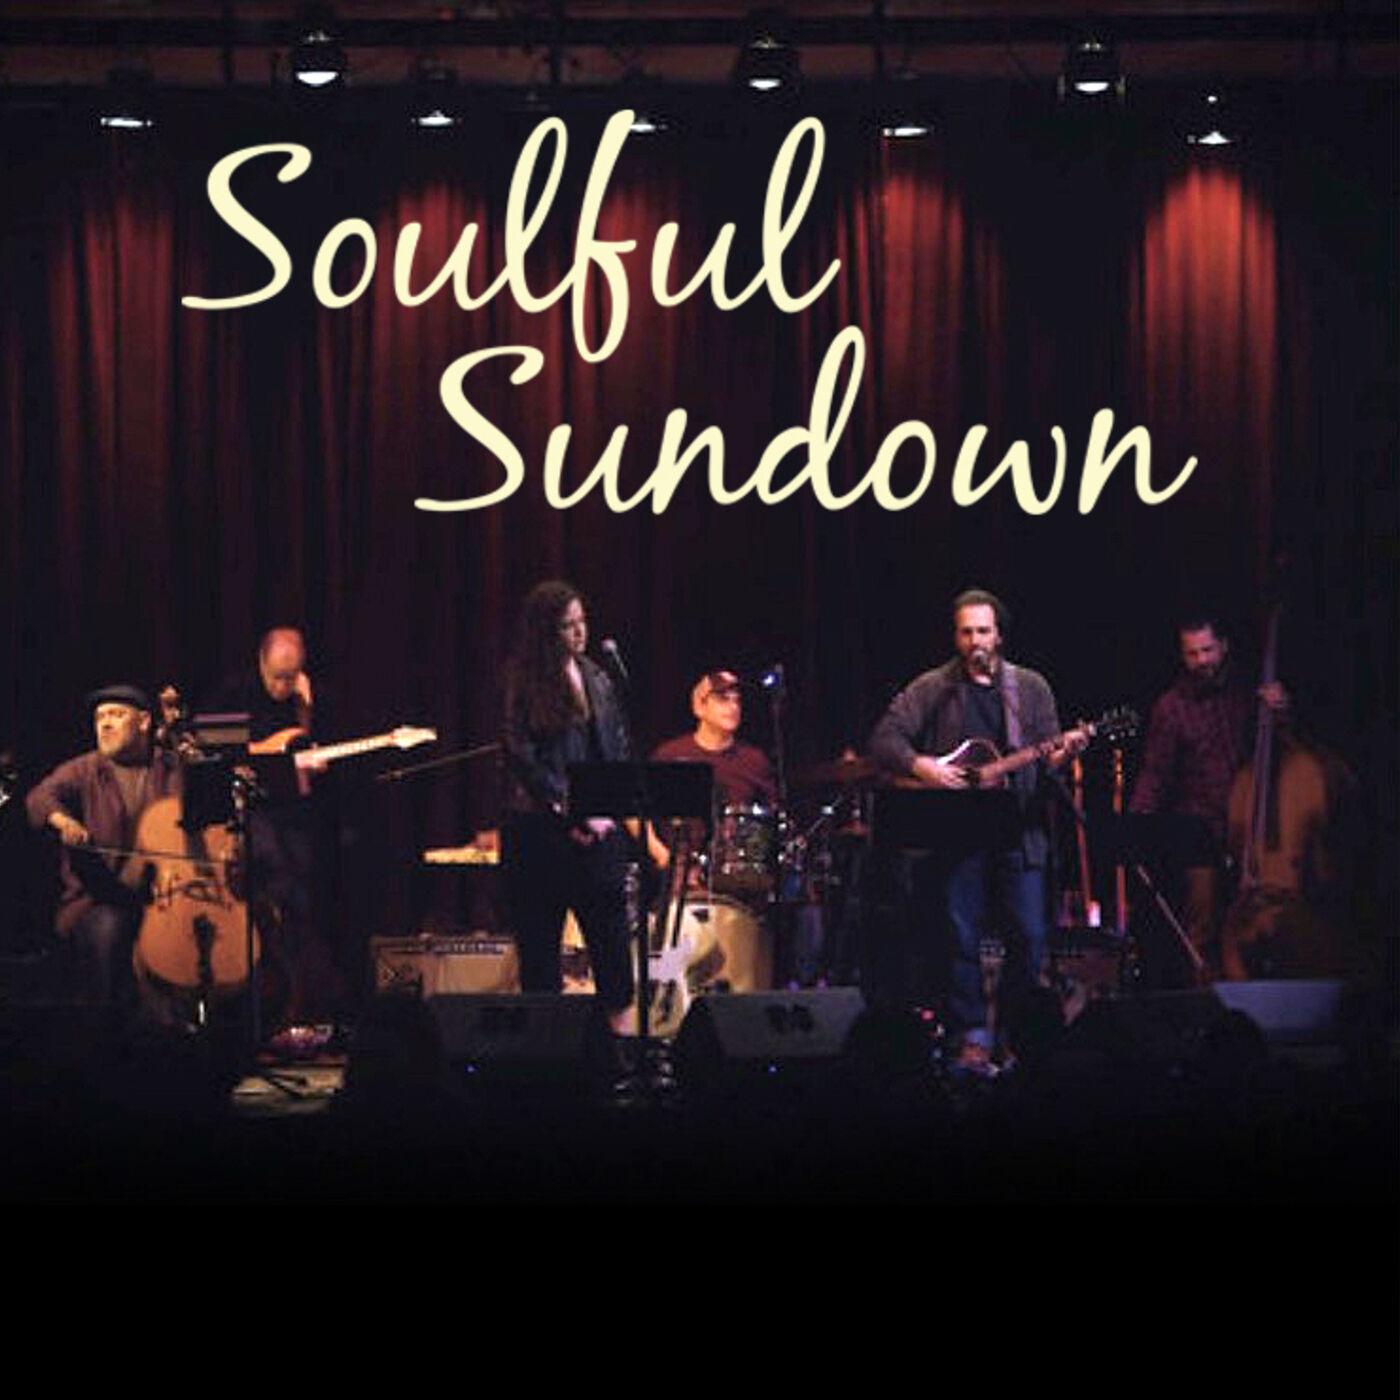 Soulful Sundown: The Future Beckons